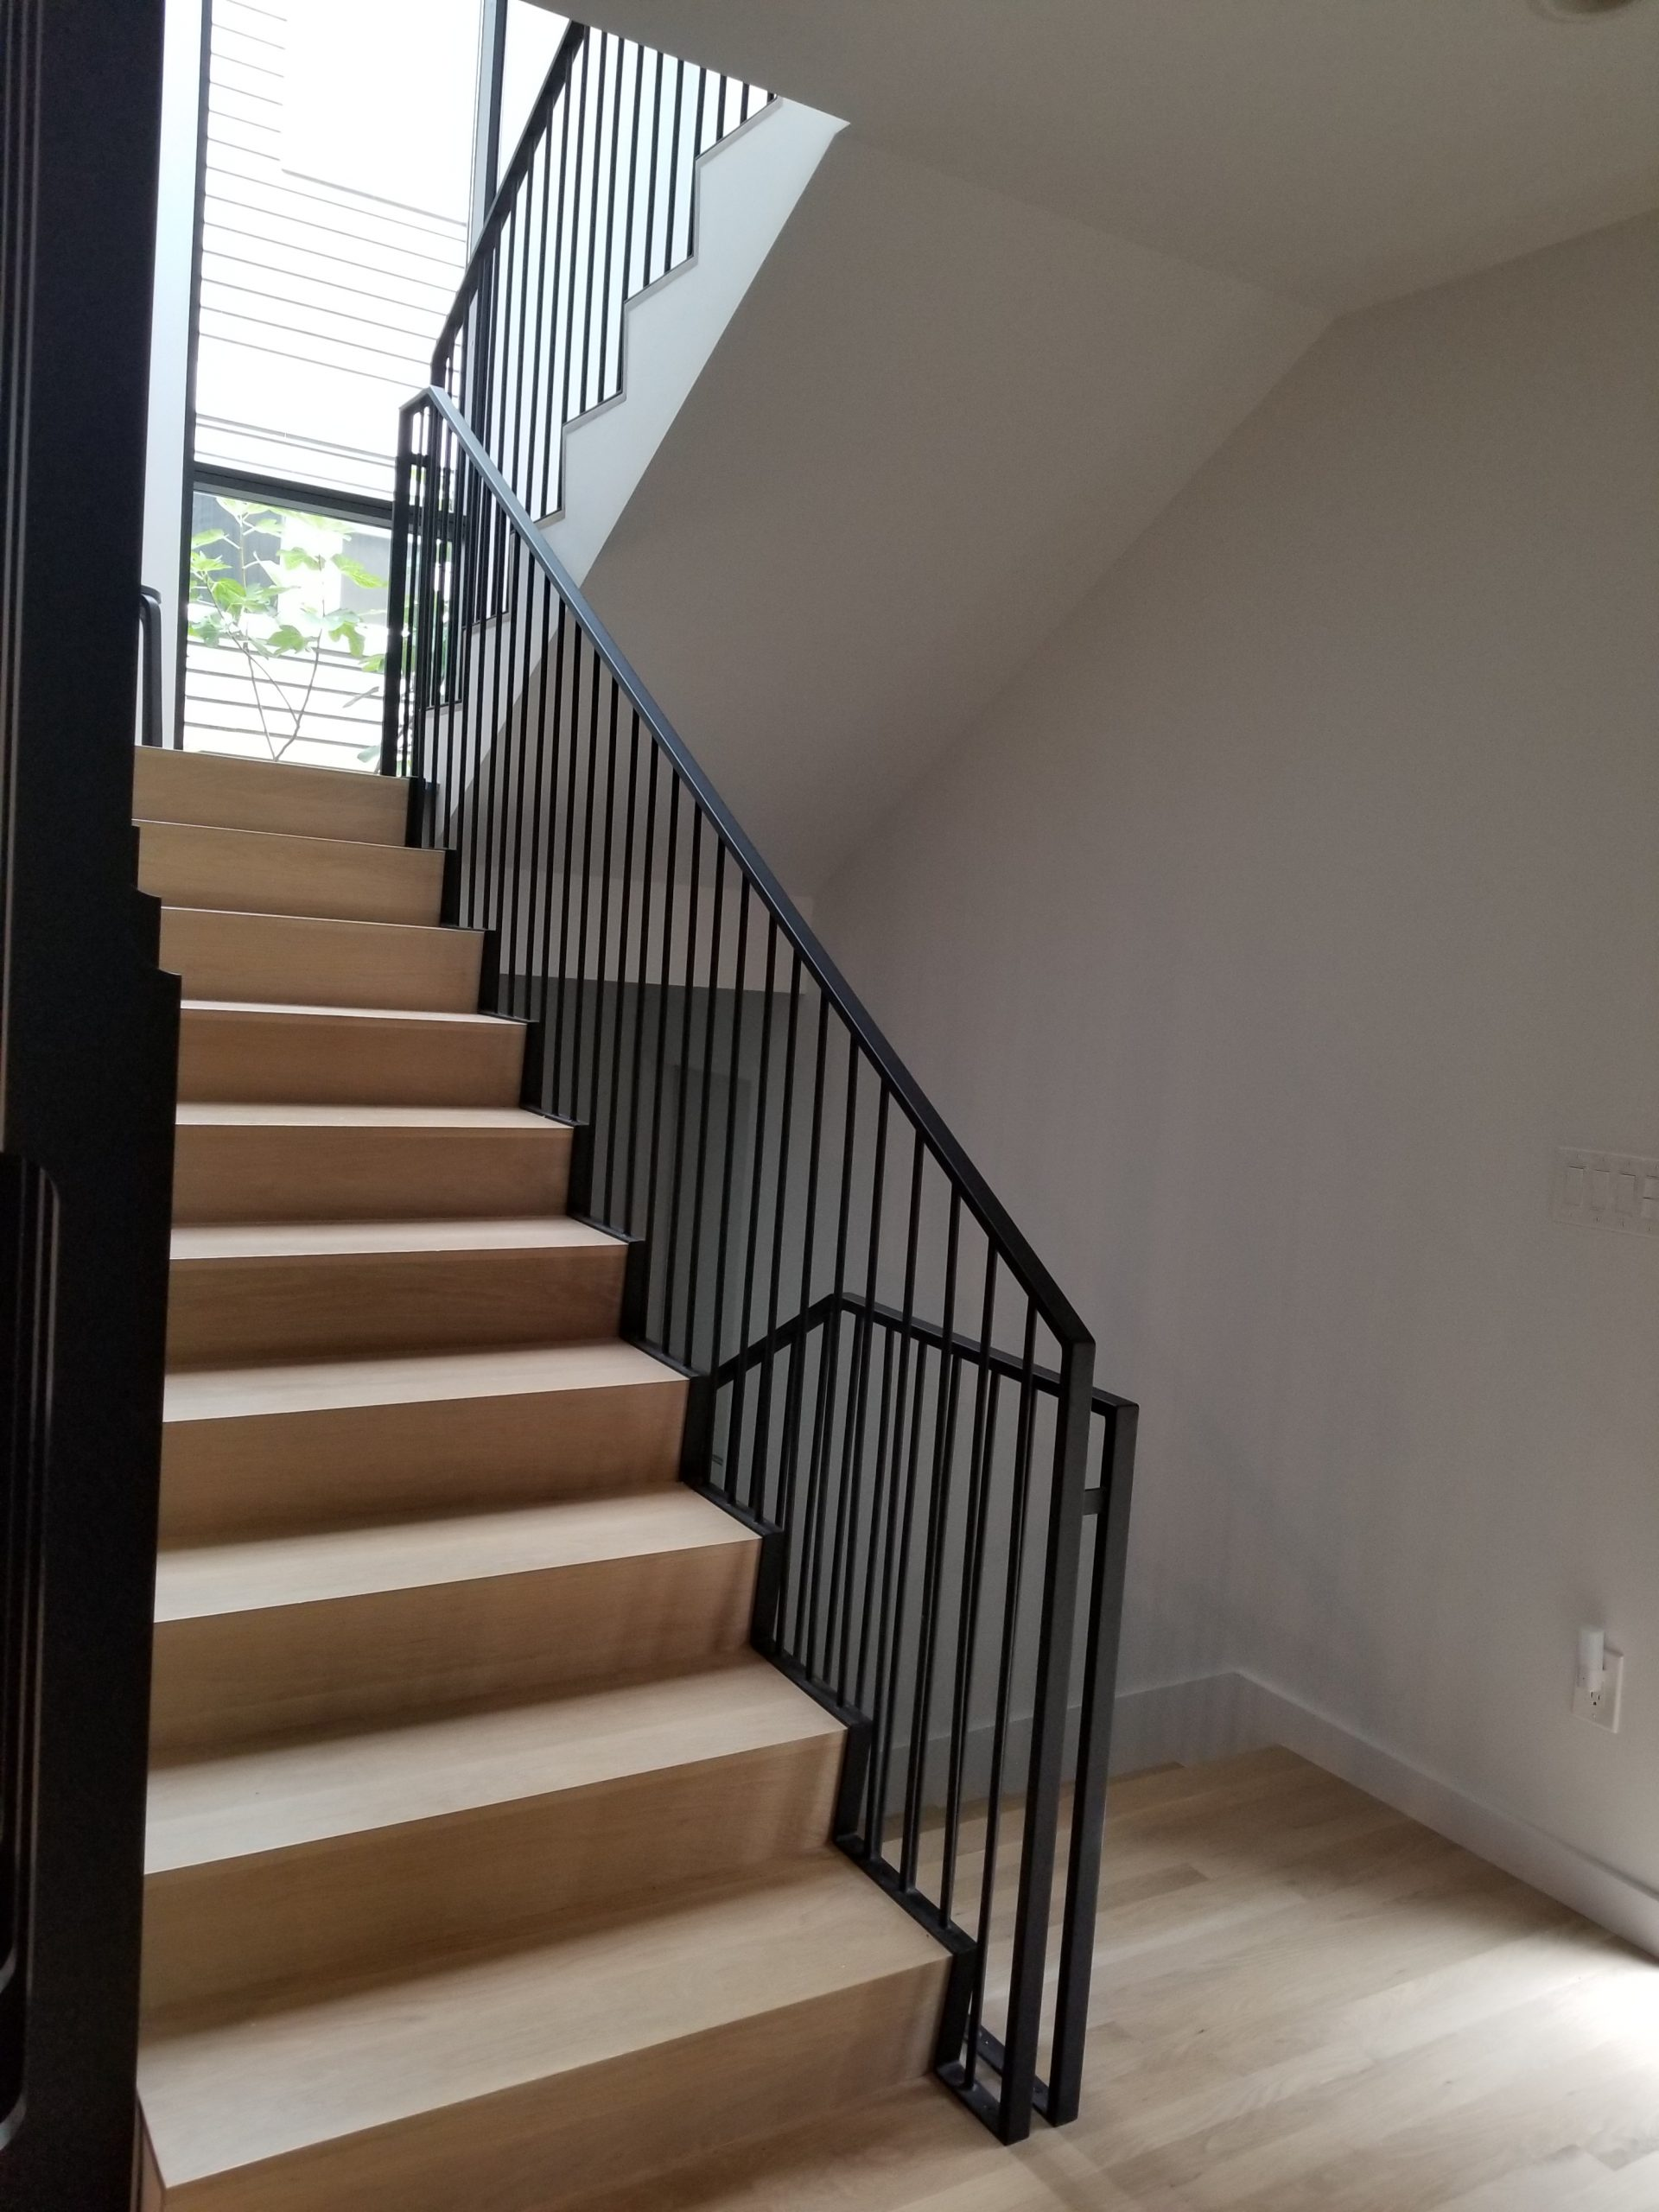 lower runner on stairs